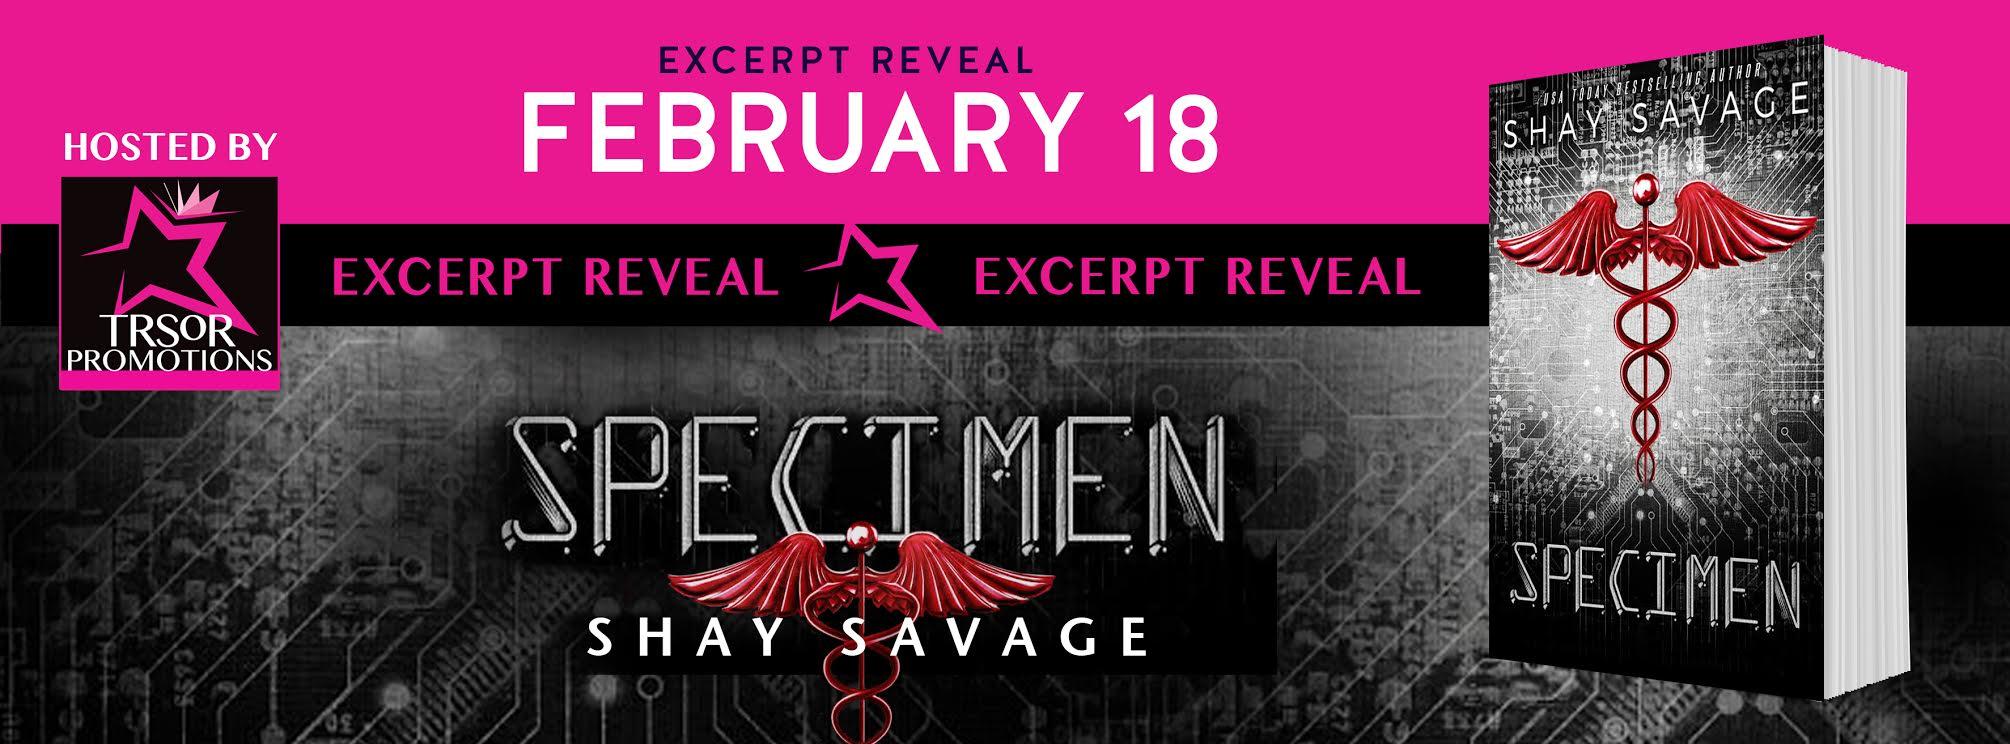 Excerpt Reveal ~ Specimen by Shay Savage